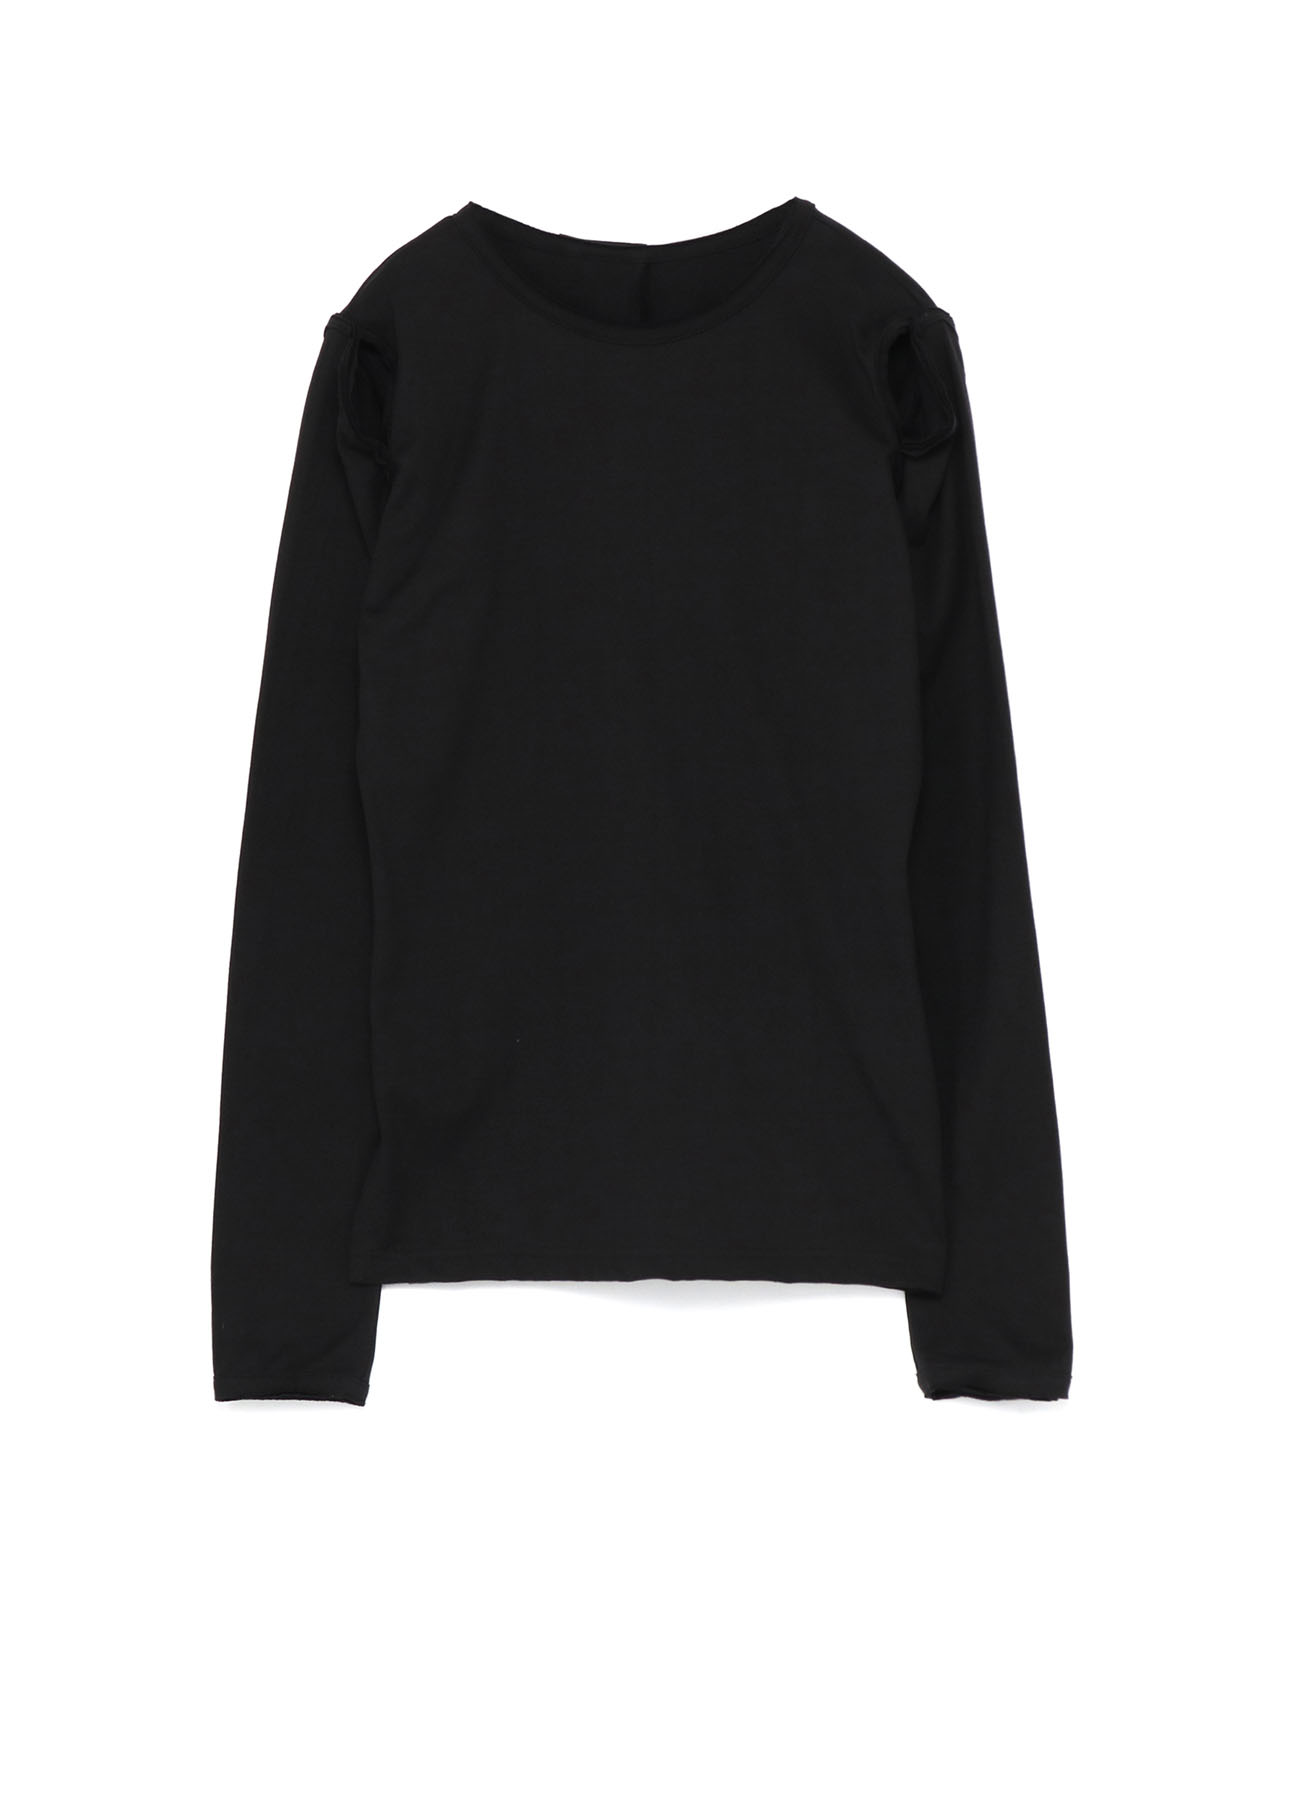 40/2 Cotton Plain stitch Sleeve Slit T-Shirt B